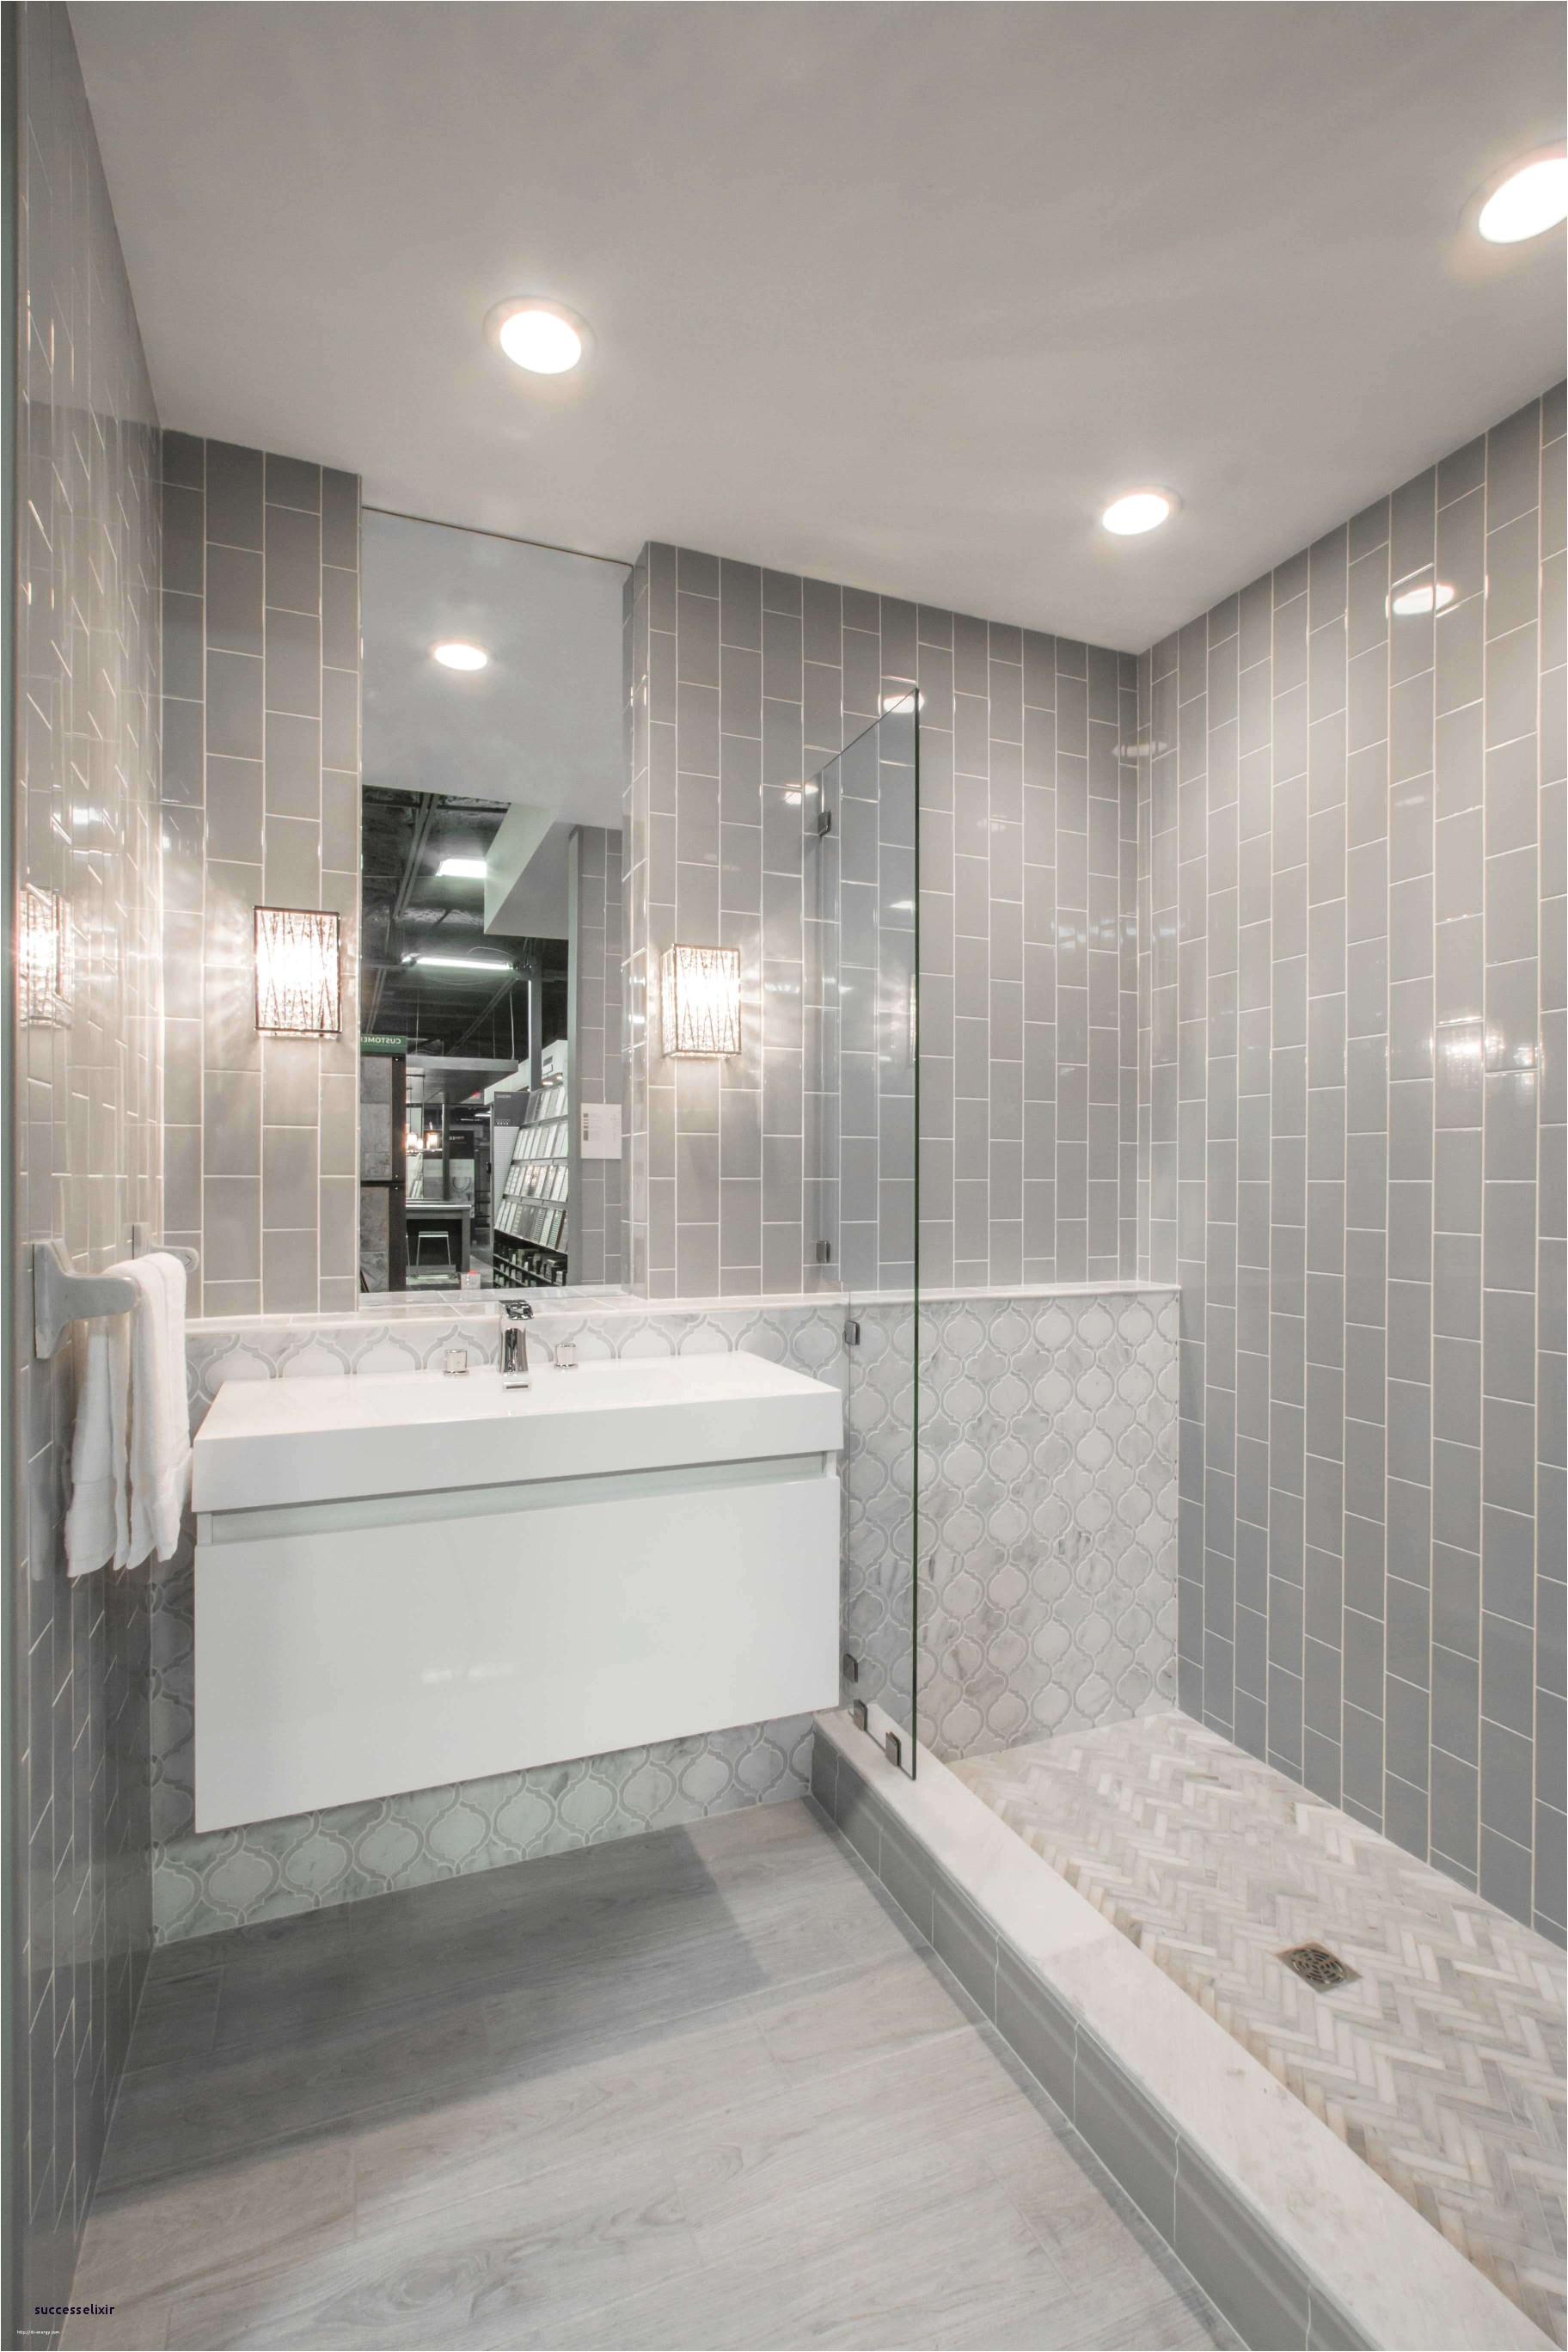 2 person bathtub beautiful 35 best bathroom shower ideas construction